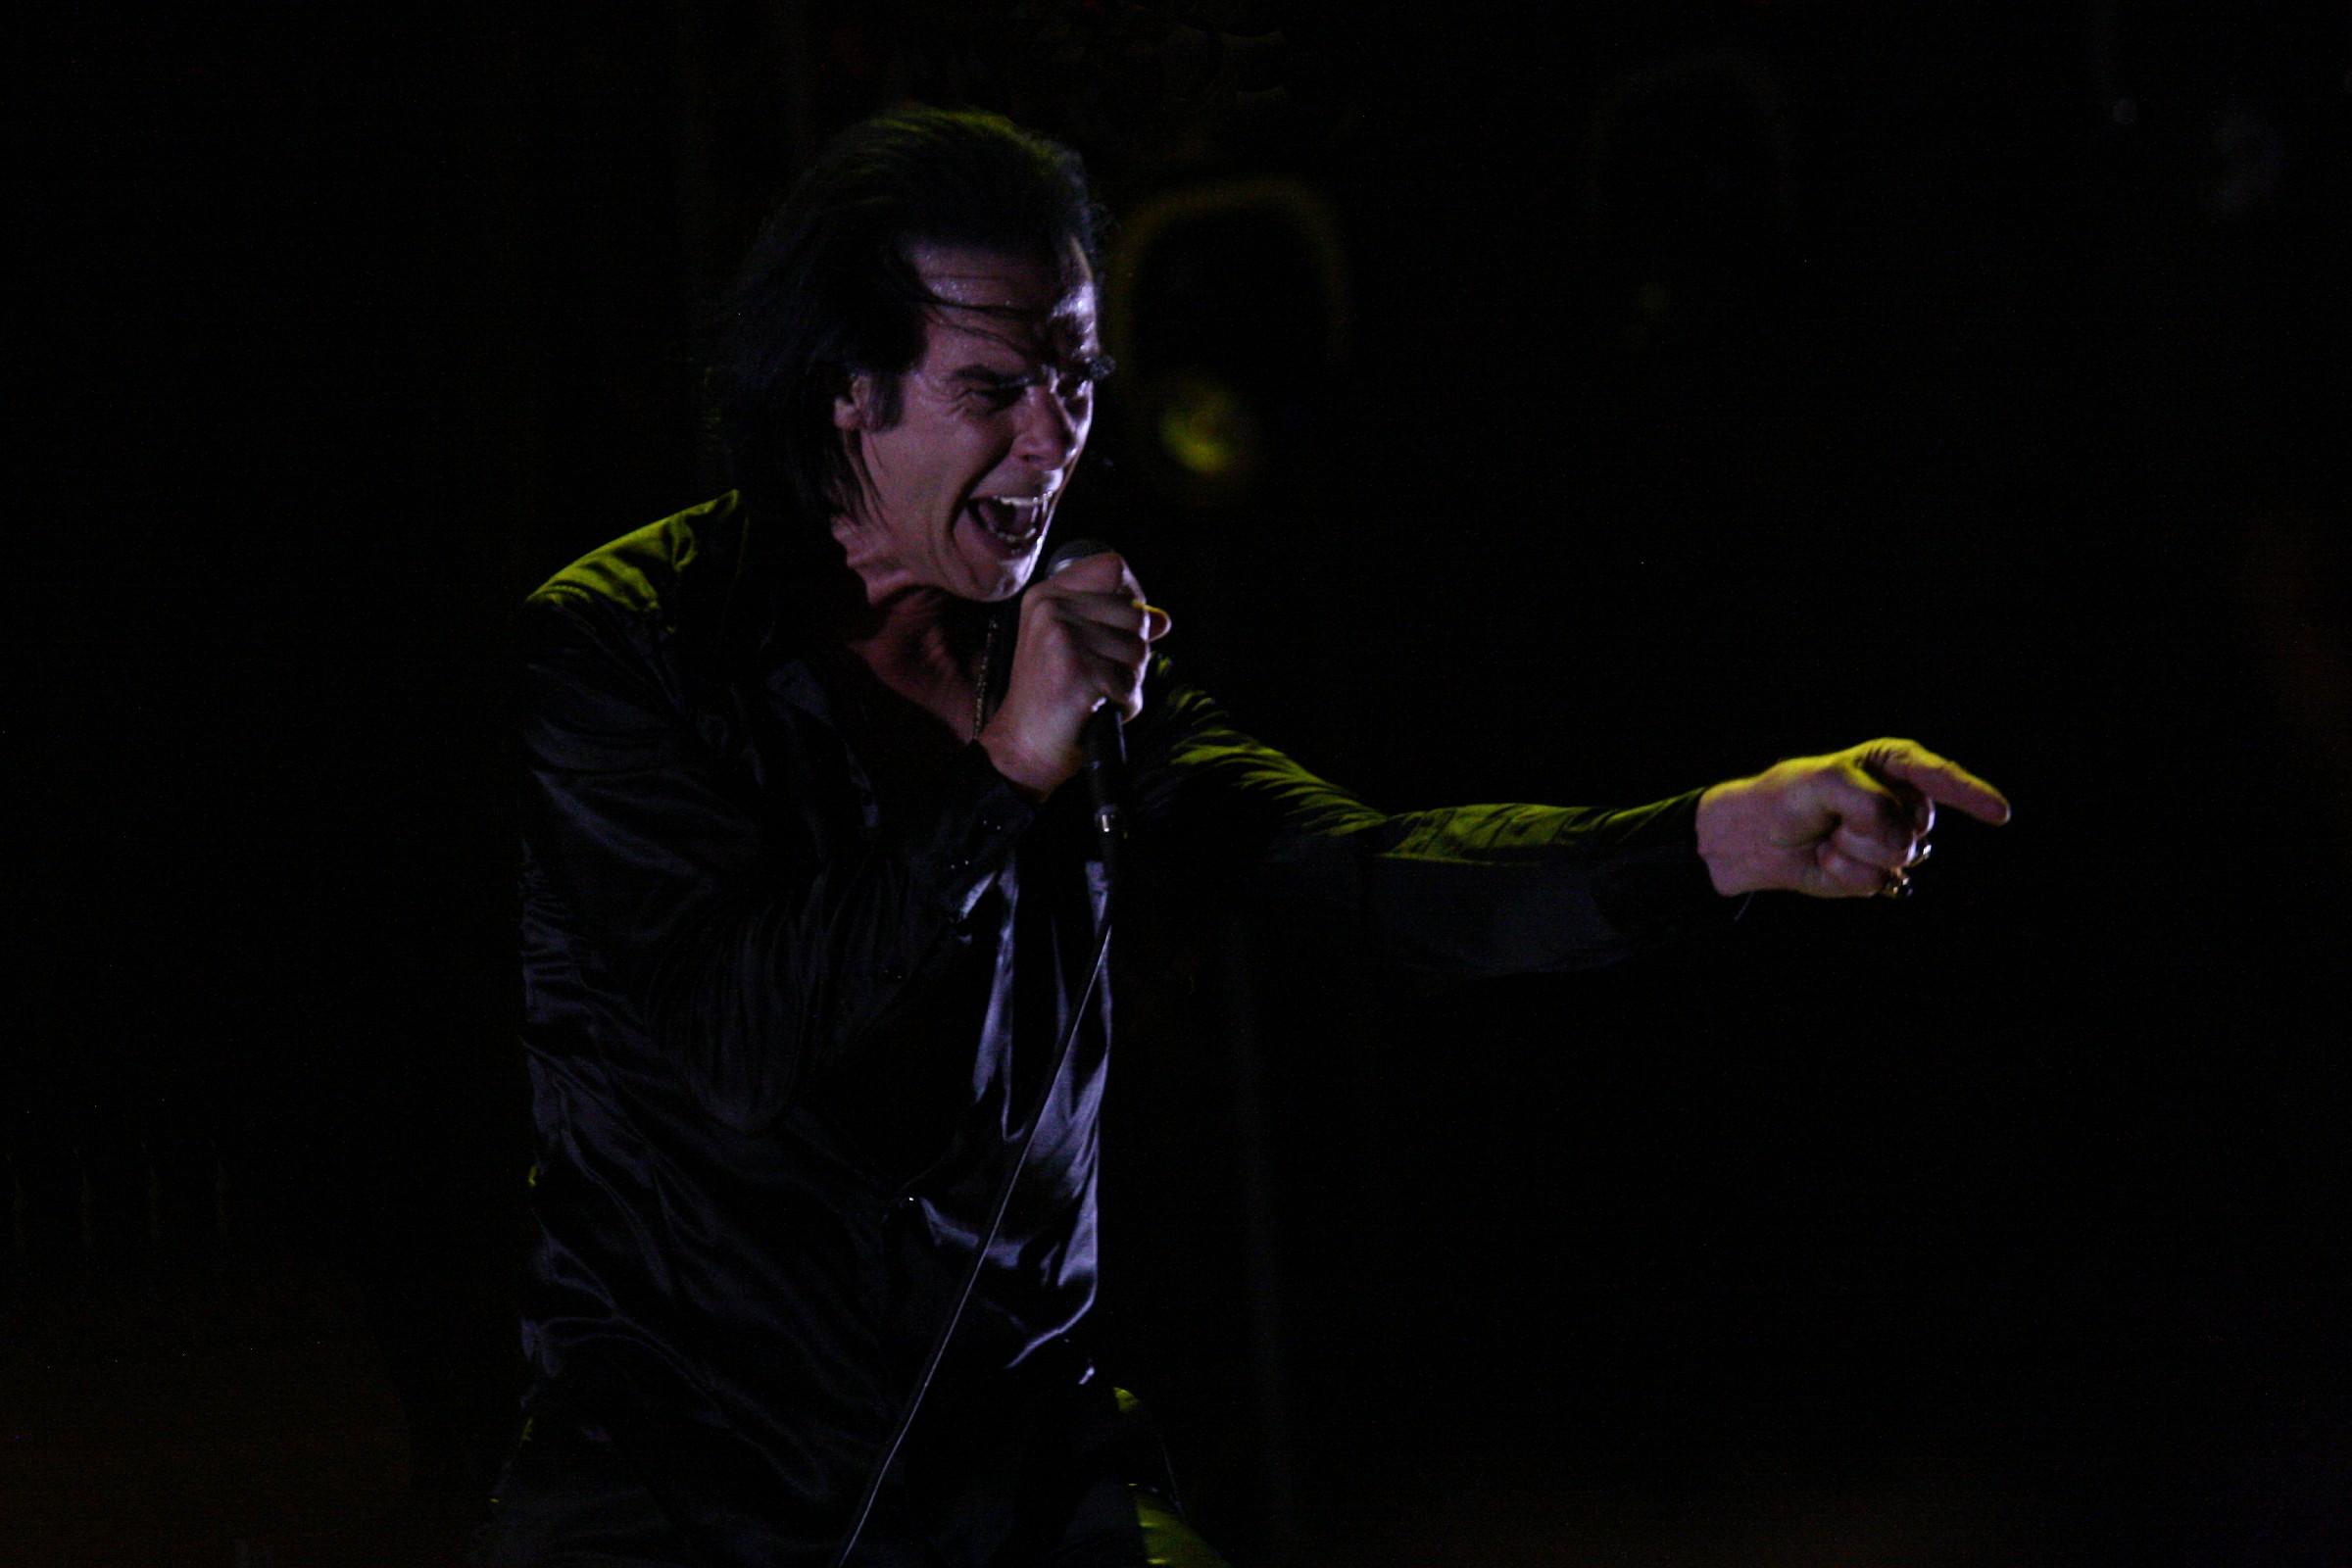 Nick Cave, Lucca 2013 # 2 alt-version...